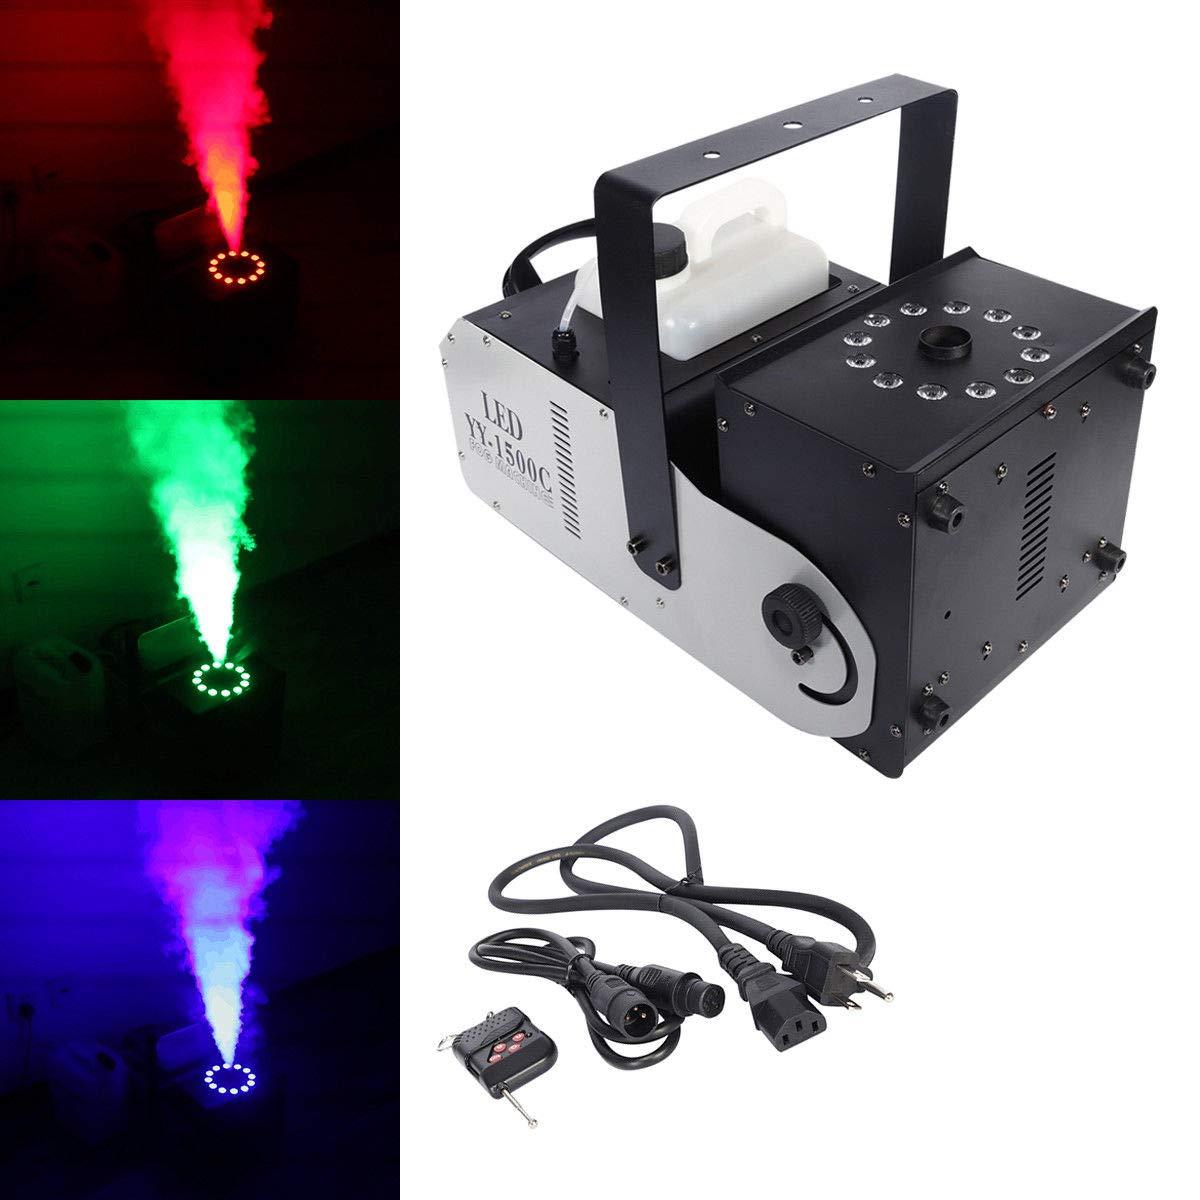 Tengchang DMX Smoke Fog Machine RGB w/Remote 12 LED 1500W 3 in 1 Spray Angle Adjustable by Tengchang